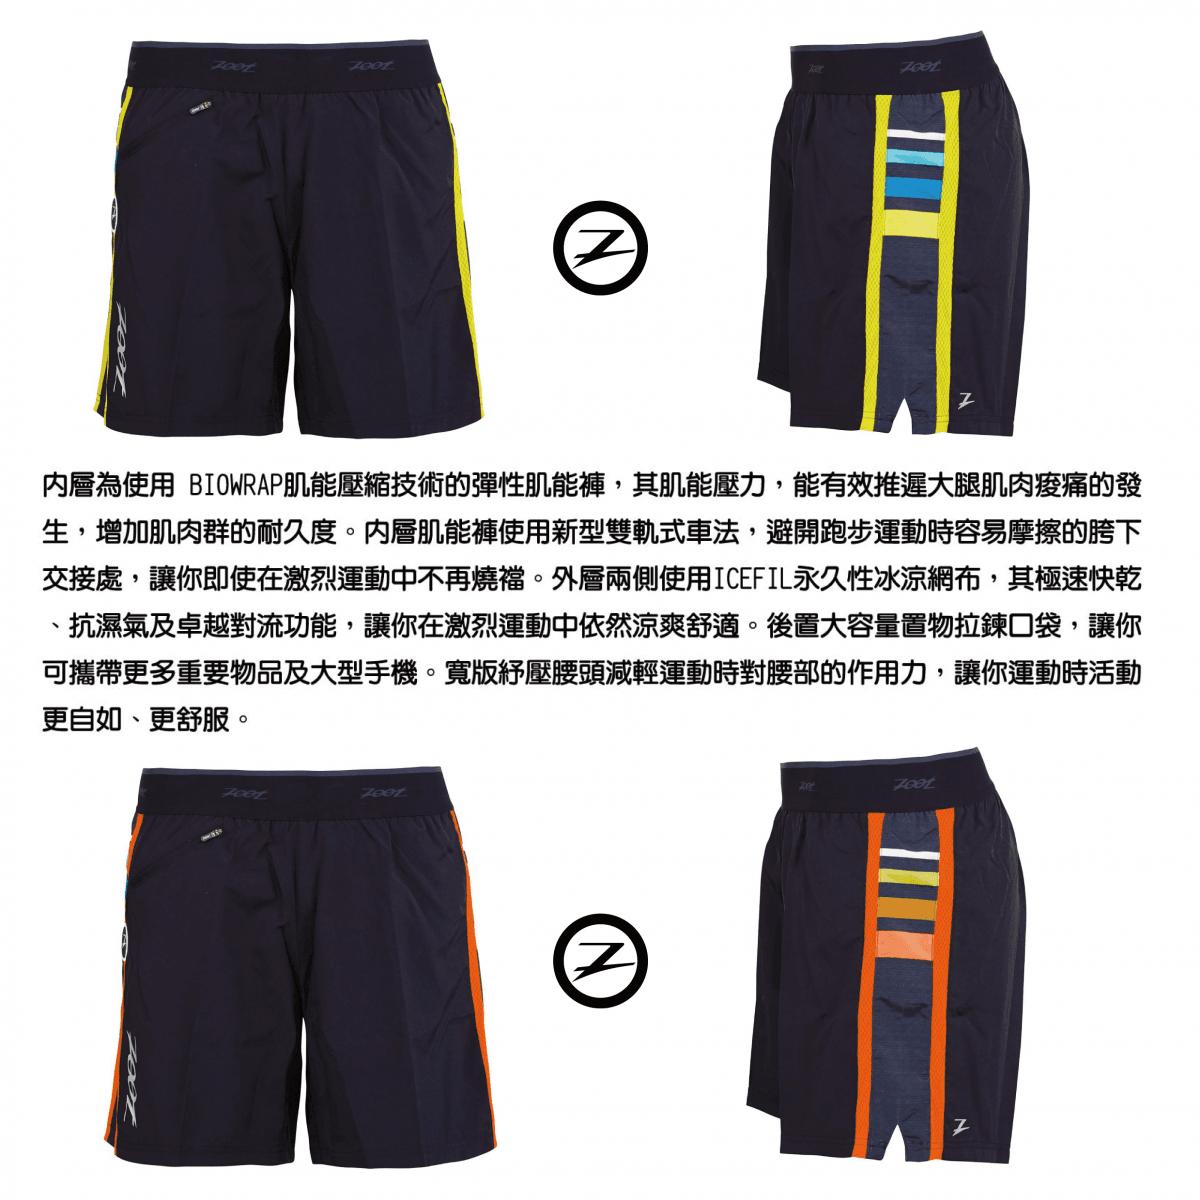 【ZOOT】 冰涼感二合一7吋輕肌能跑褲 (男) 3